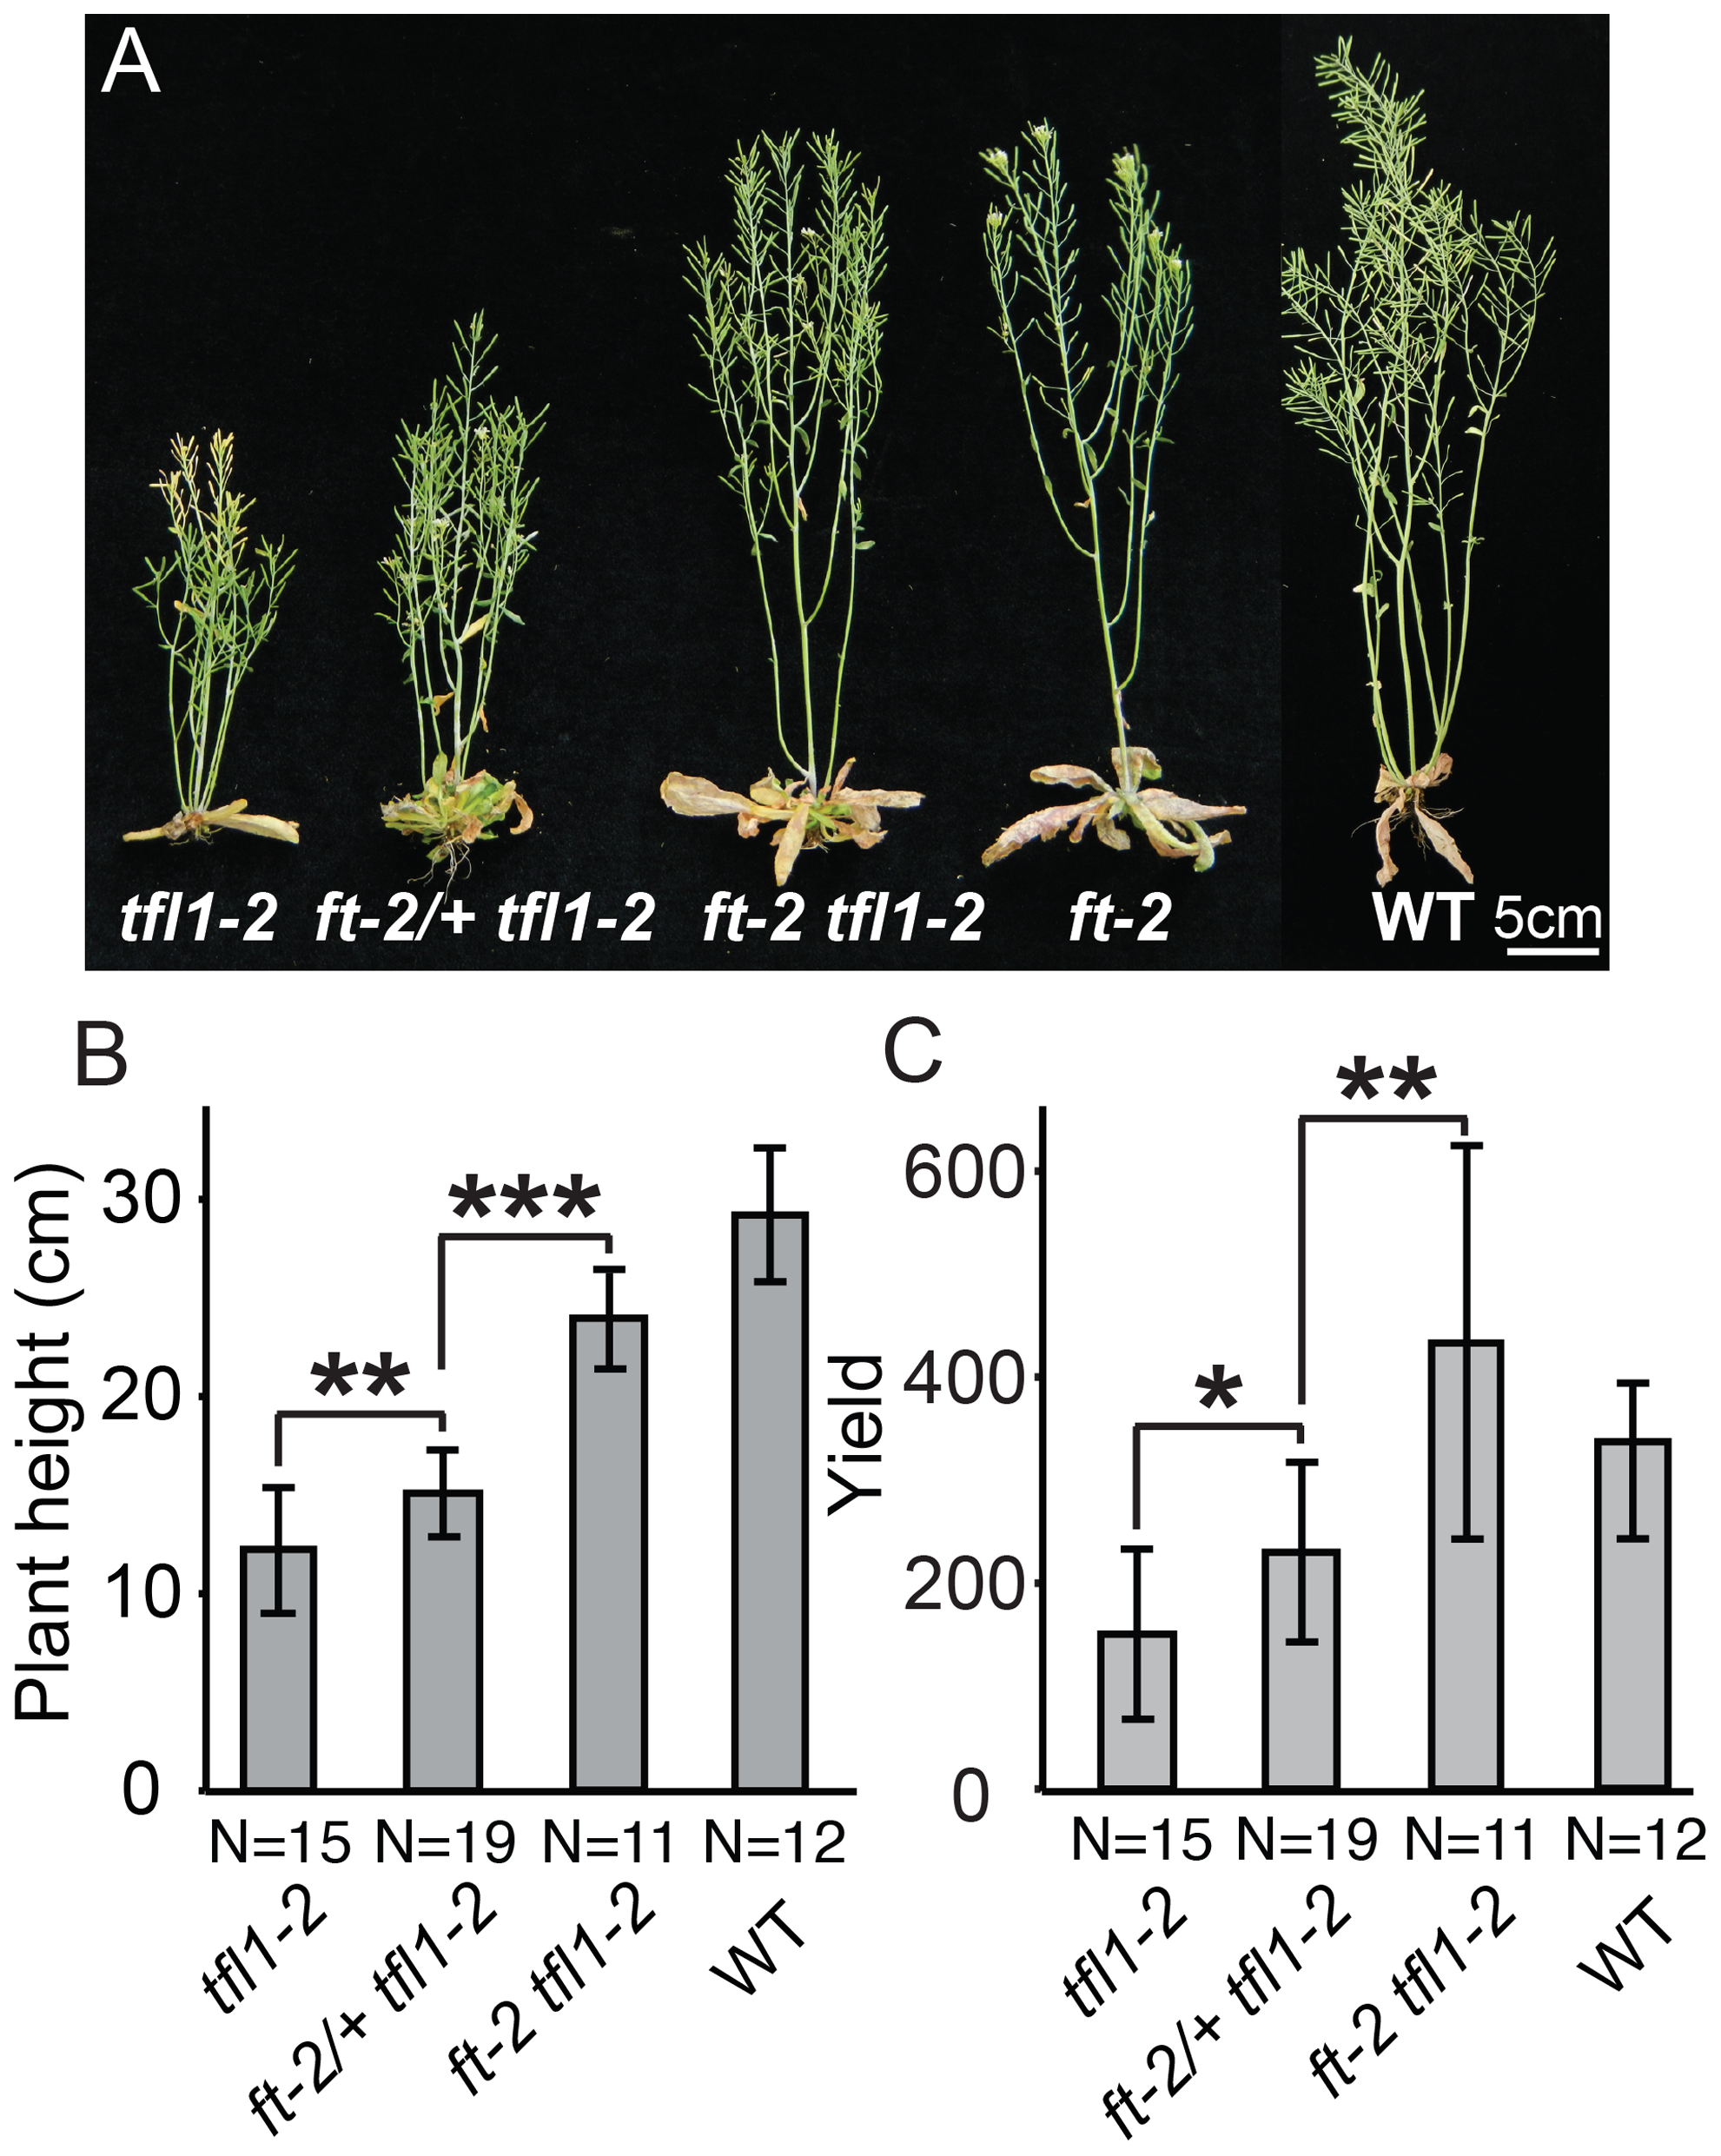 Dose-dependent suppression of <i>tfl1</i> (<i>sp</i>) by <i>ft/</i>+ (<i>sft/</i>+) heterozygosity is conserved in <i>Arabidopsis thaliana</i>.